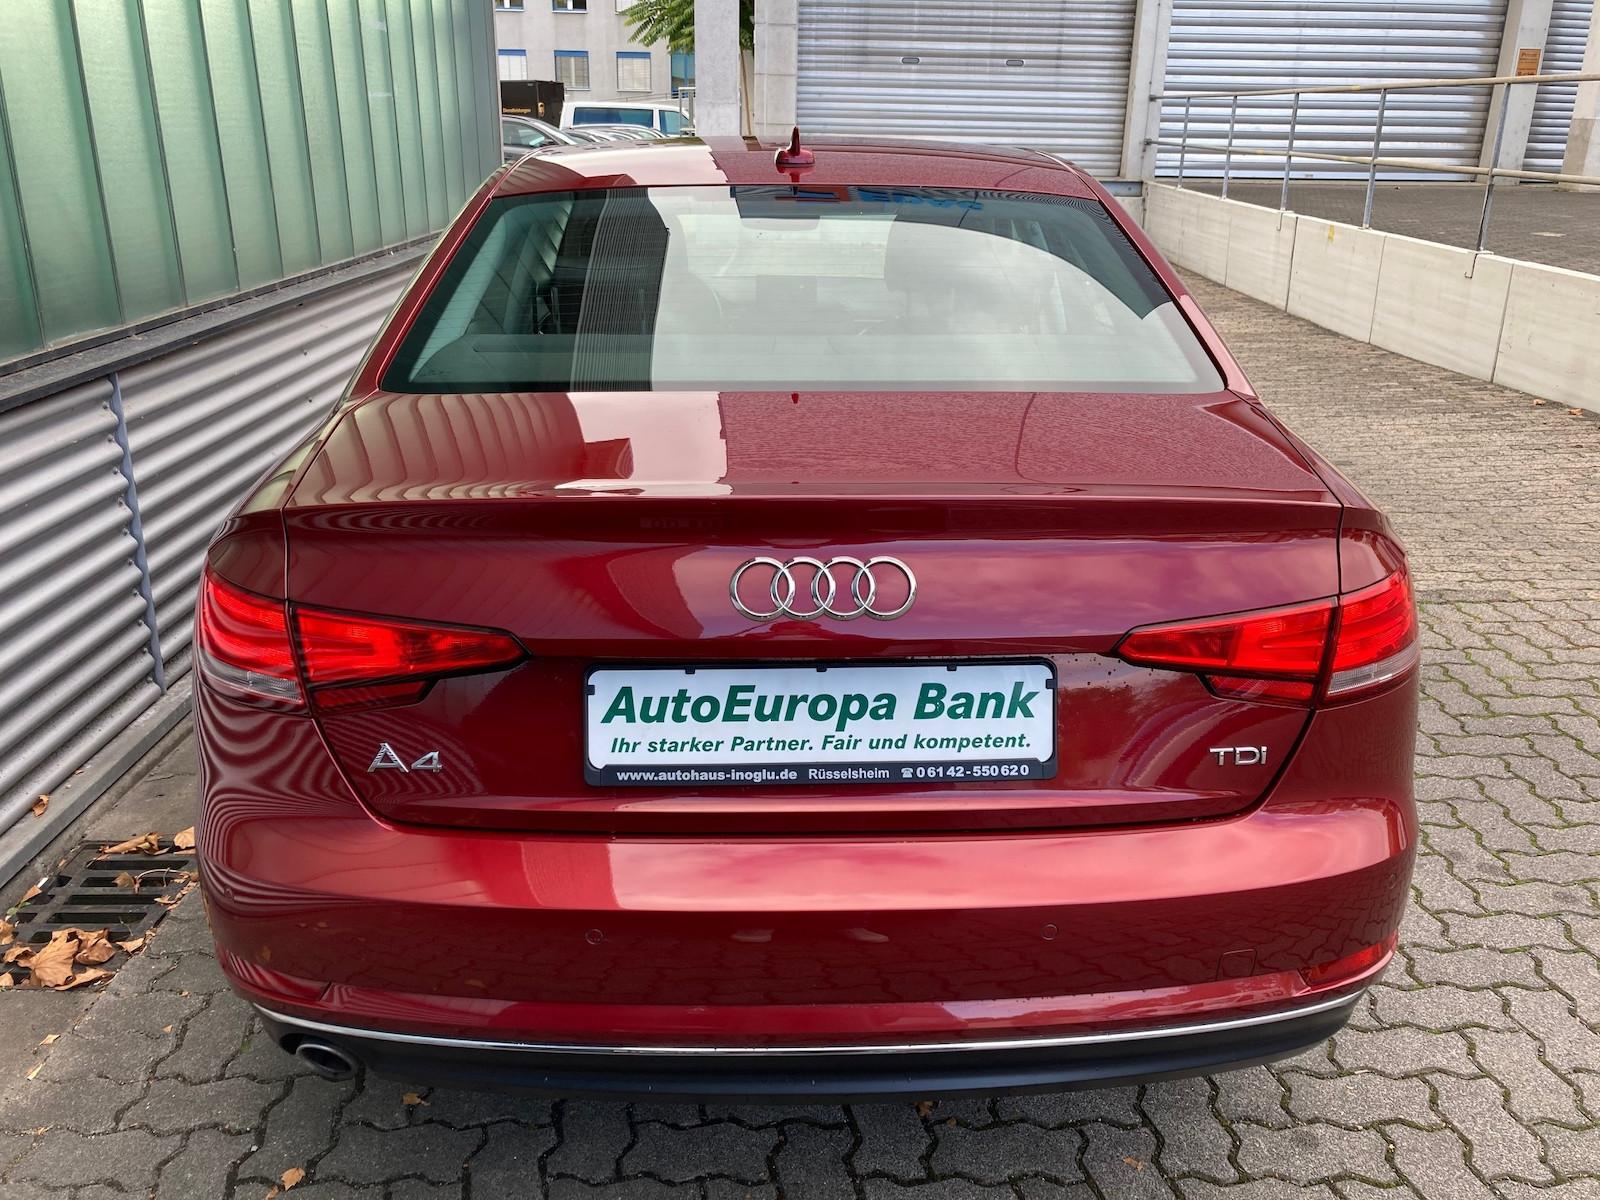 Audi_A4__13